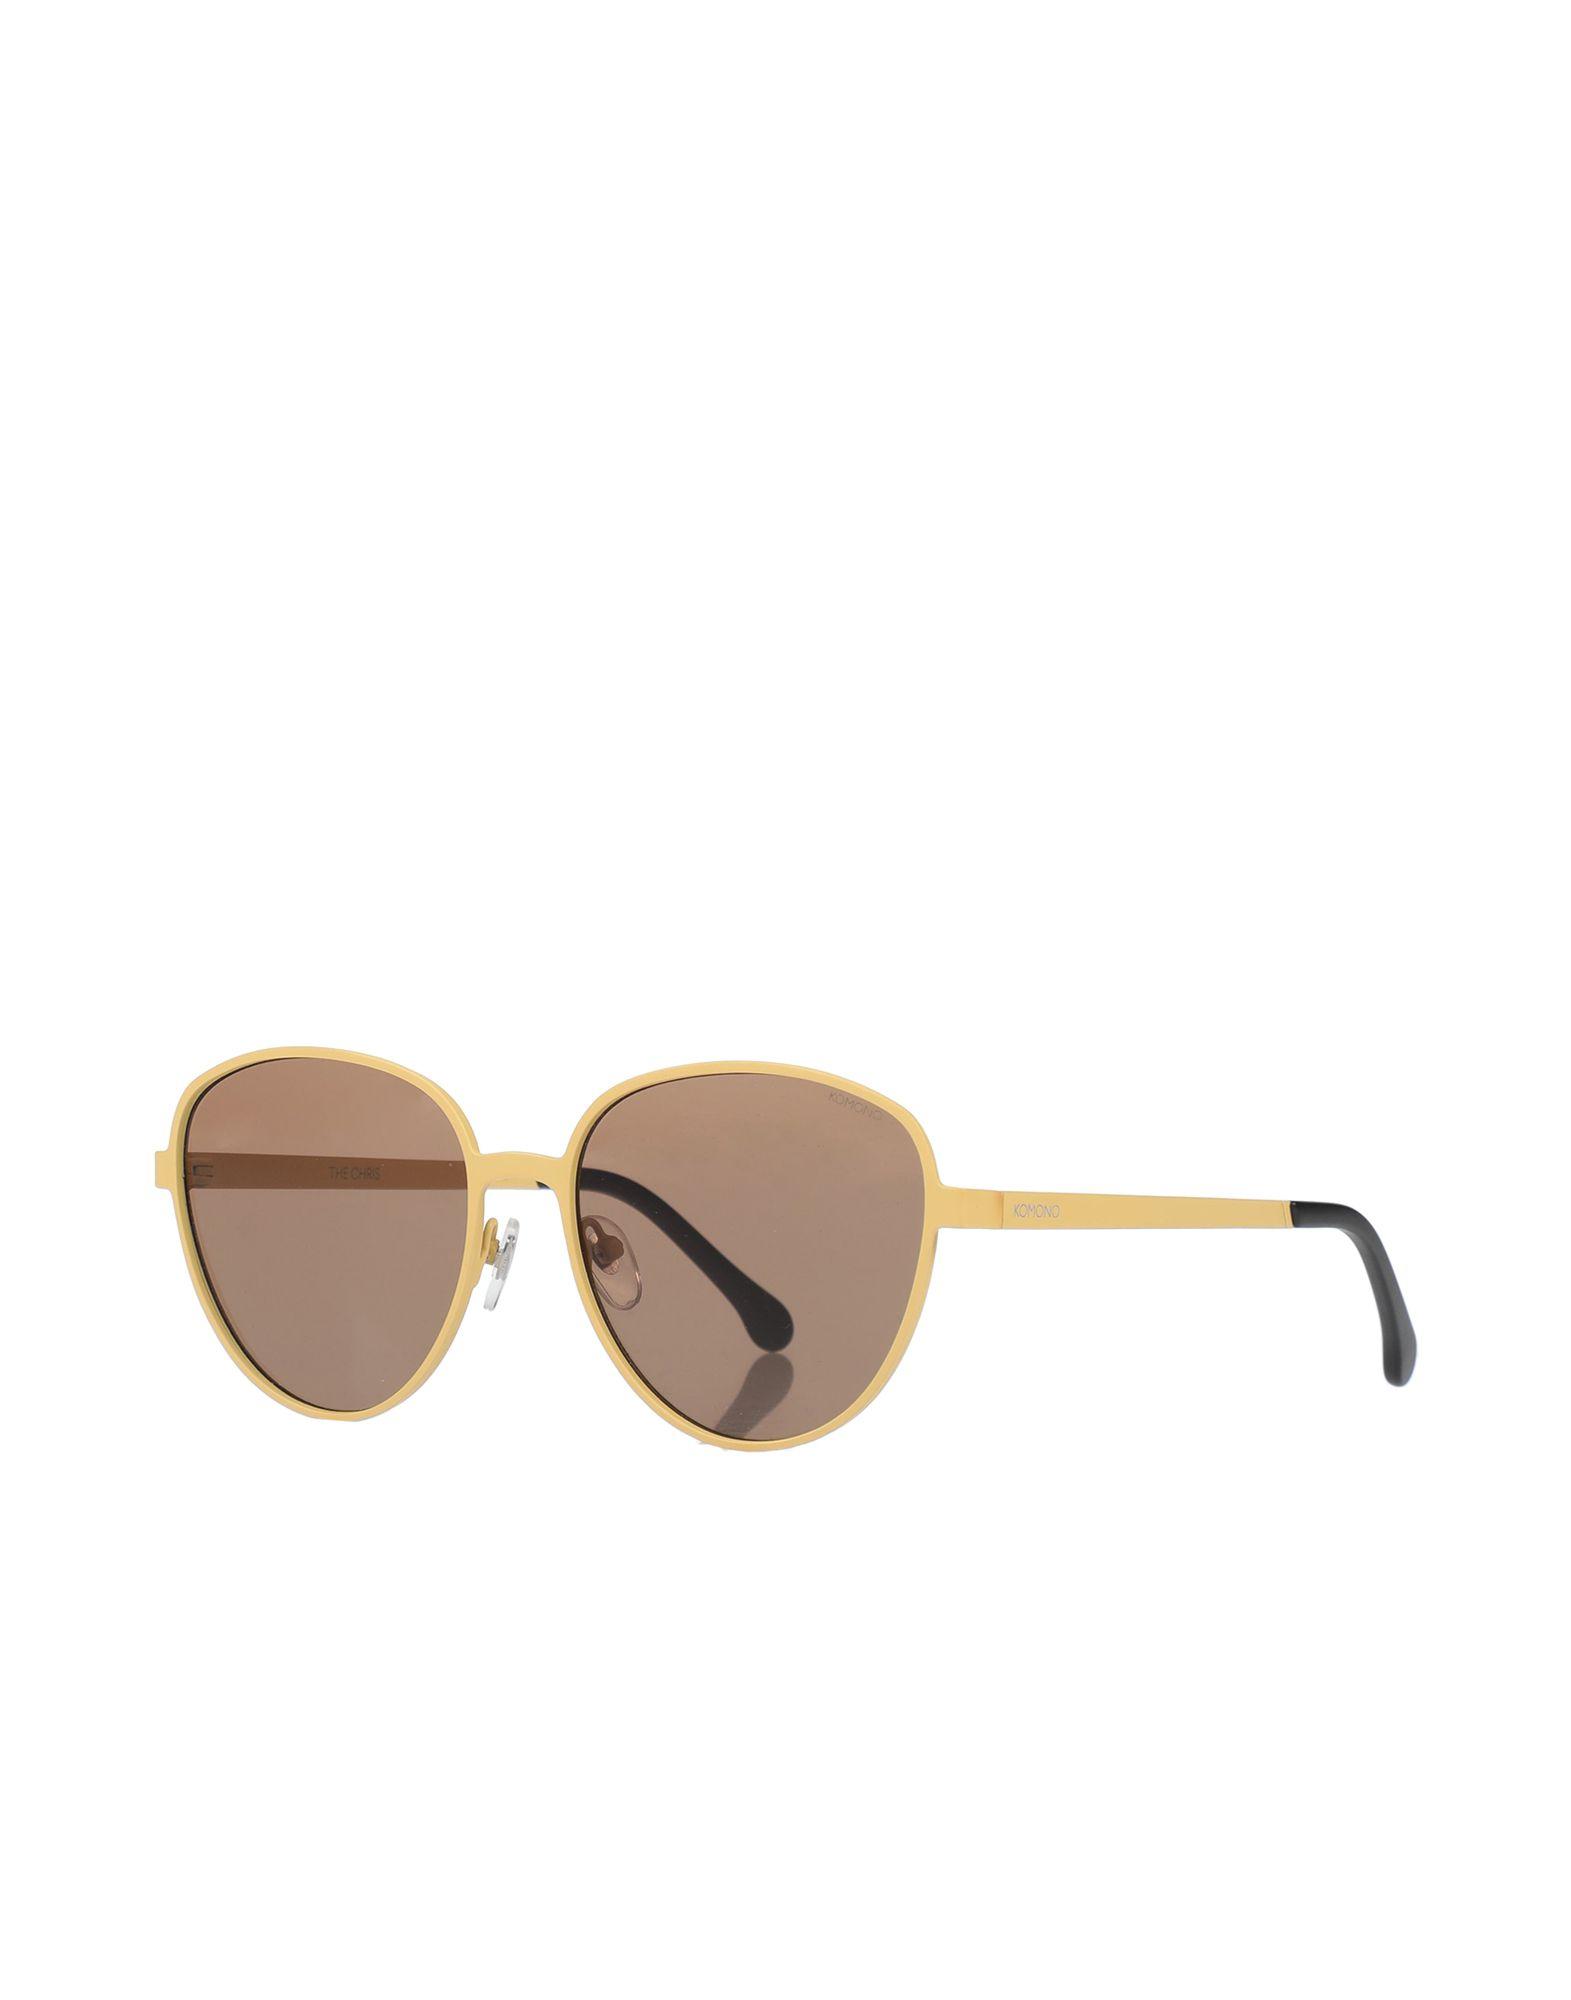 KOMONO Sunglasses - Item 46680706